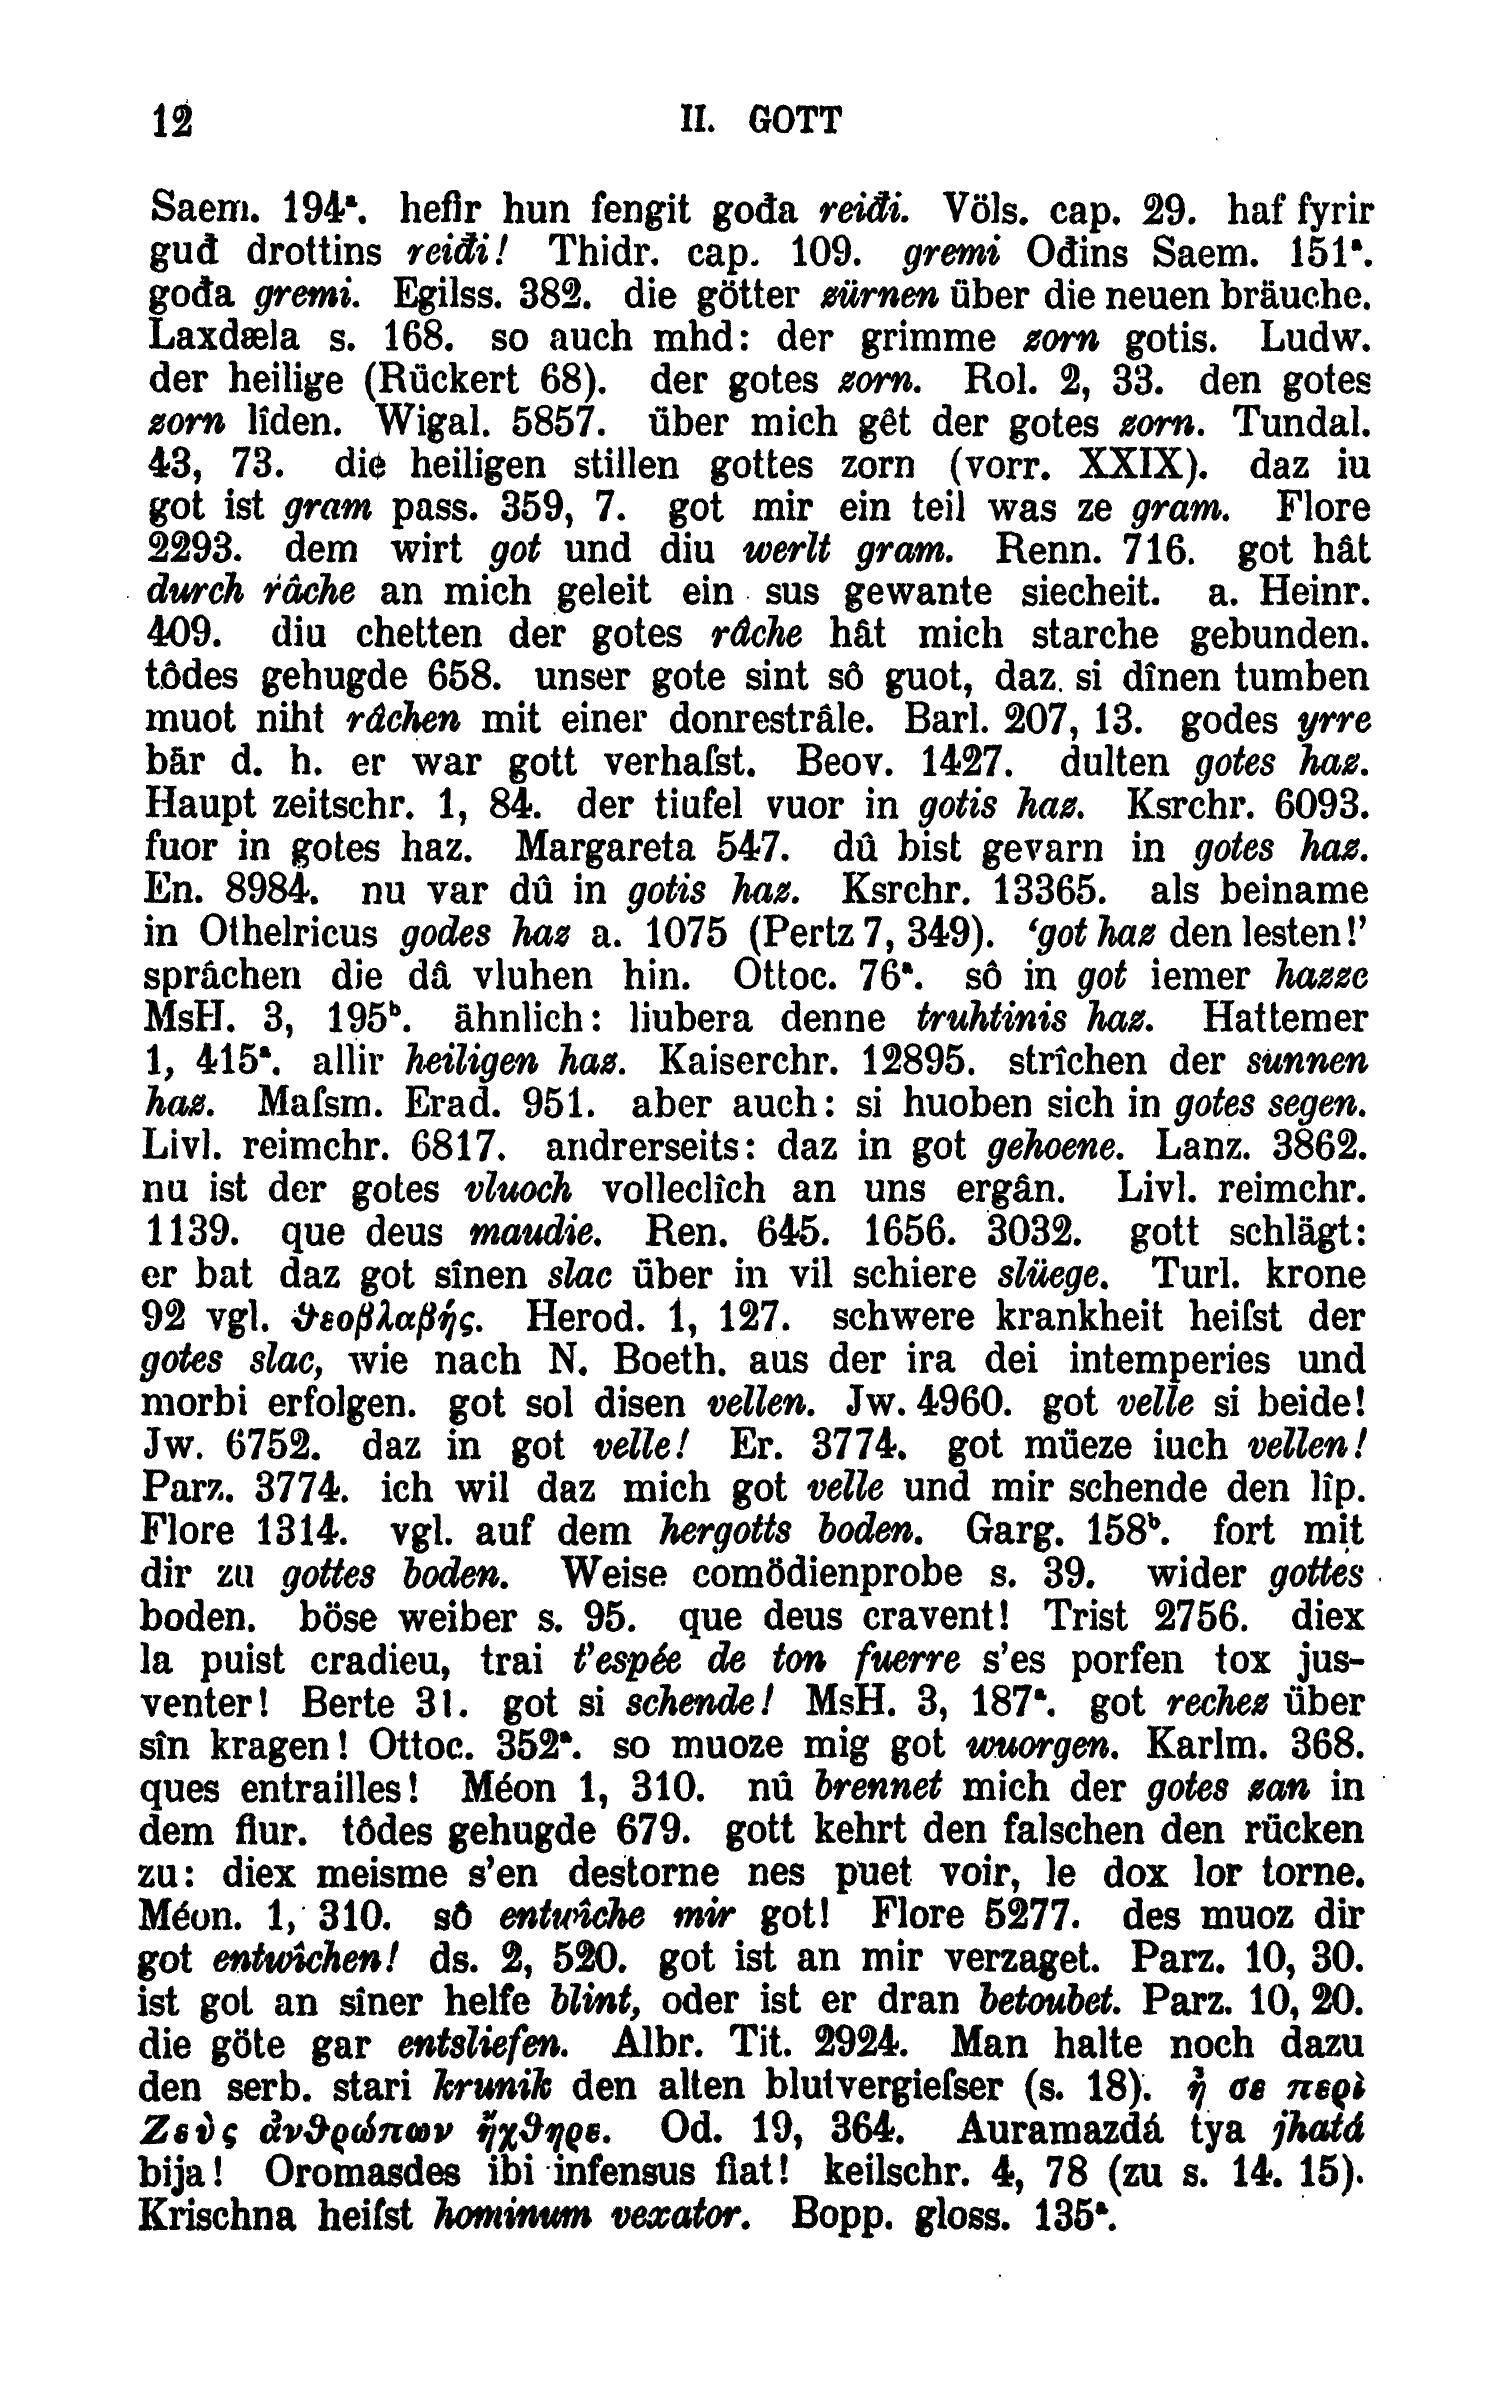 File:Deutsche Mythologie (Grimm) V3 026.jpg - Wikimedia Commons